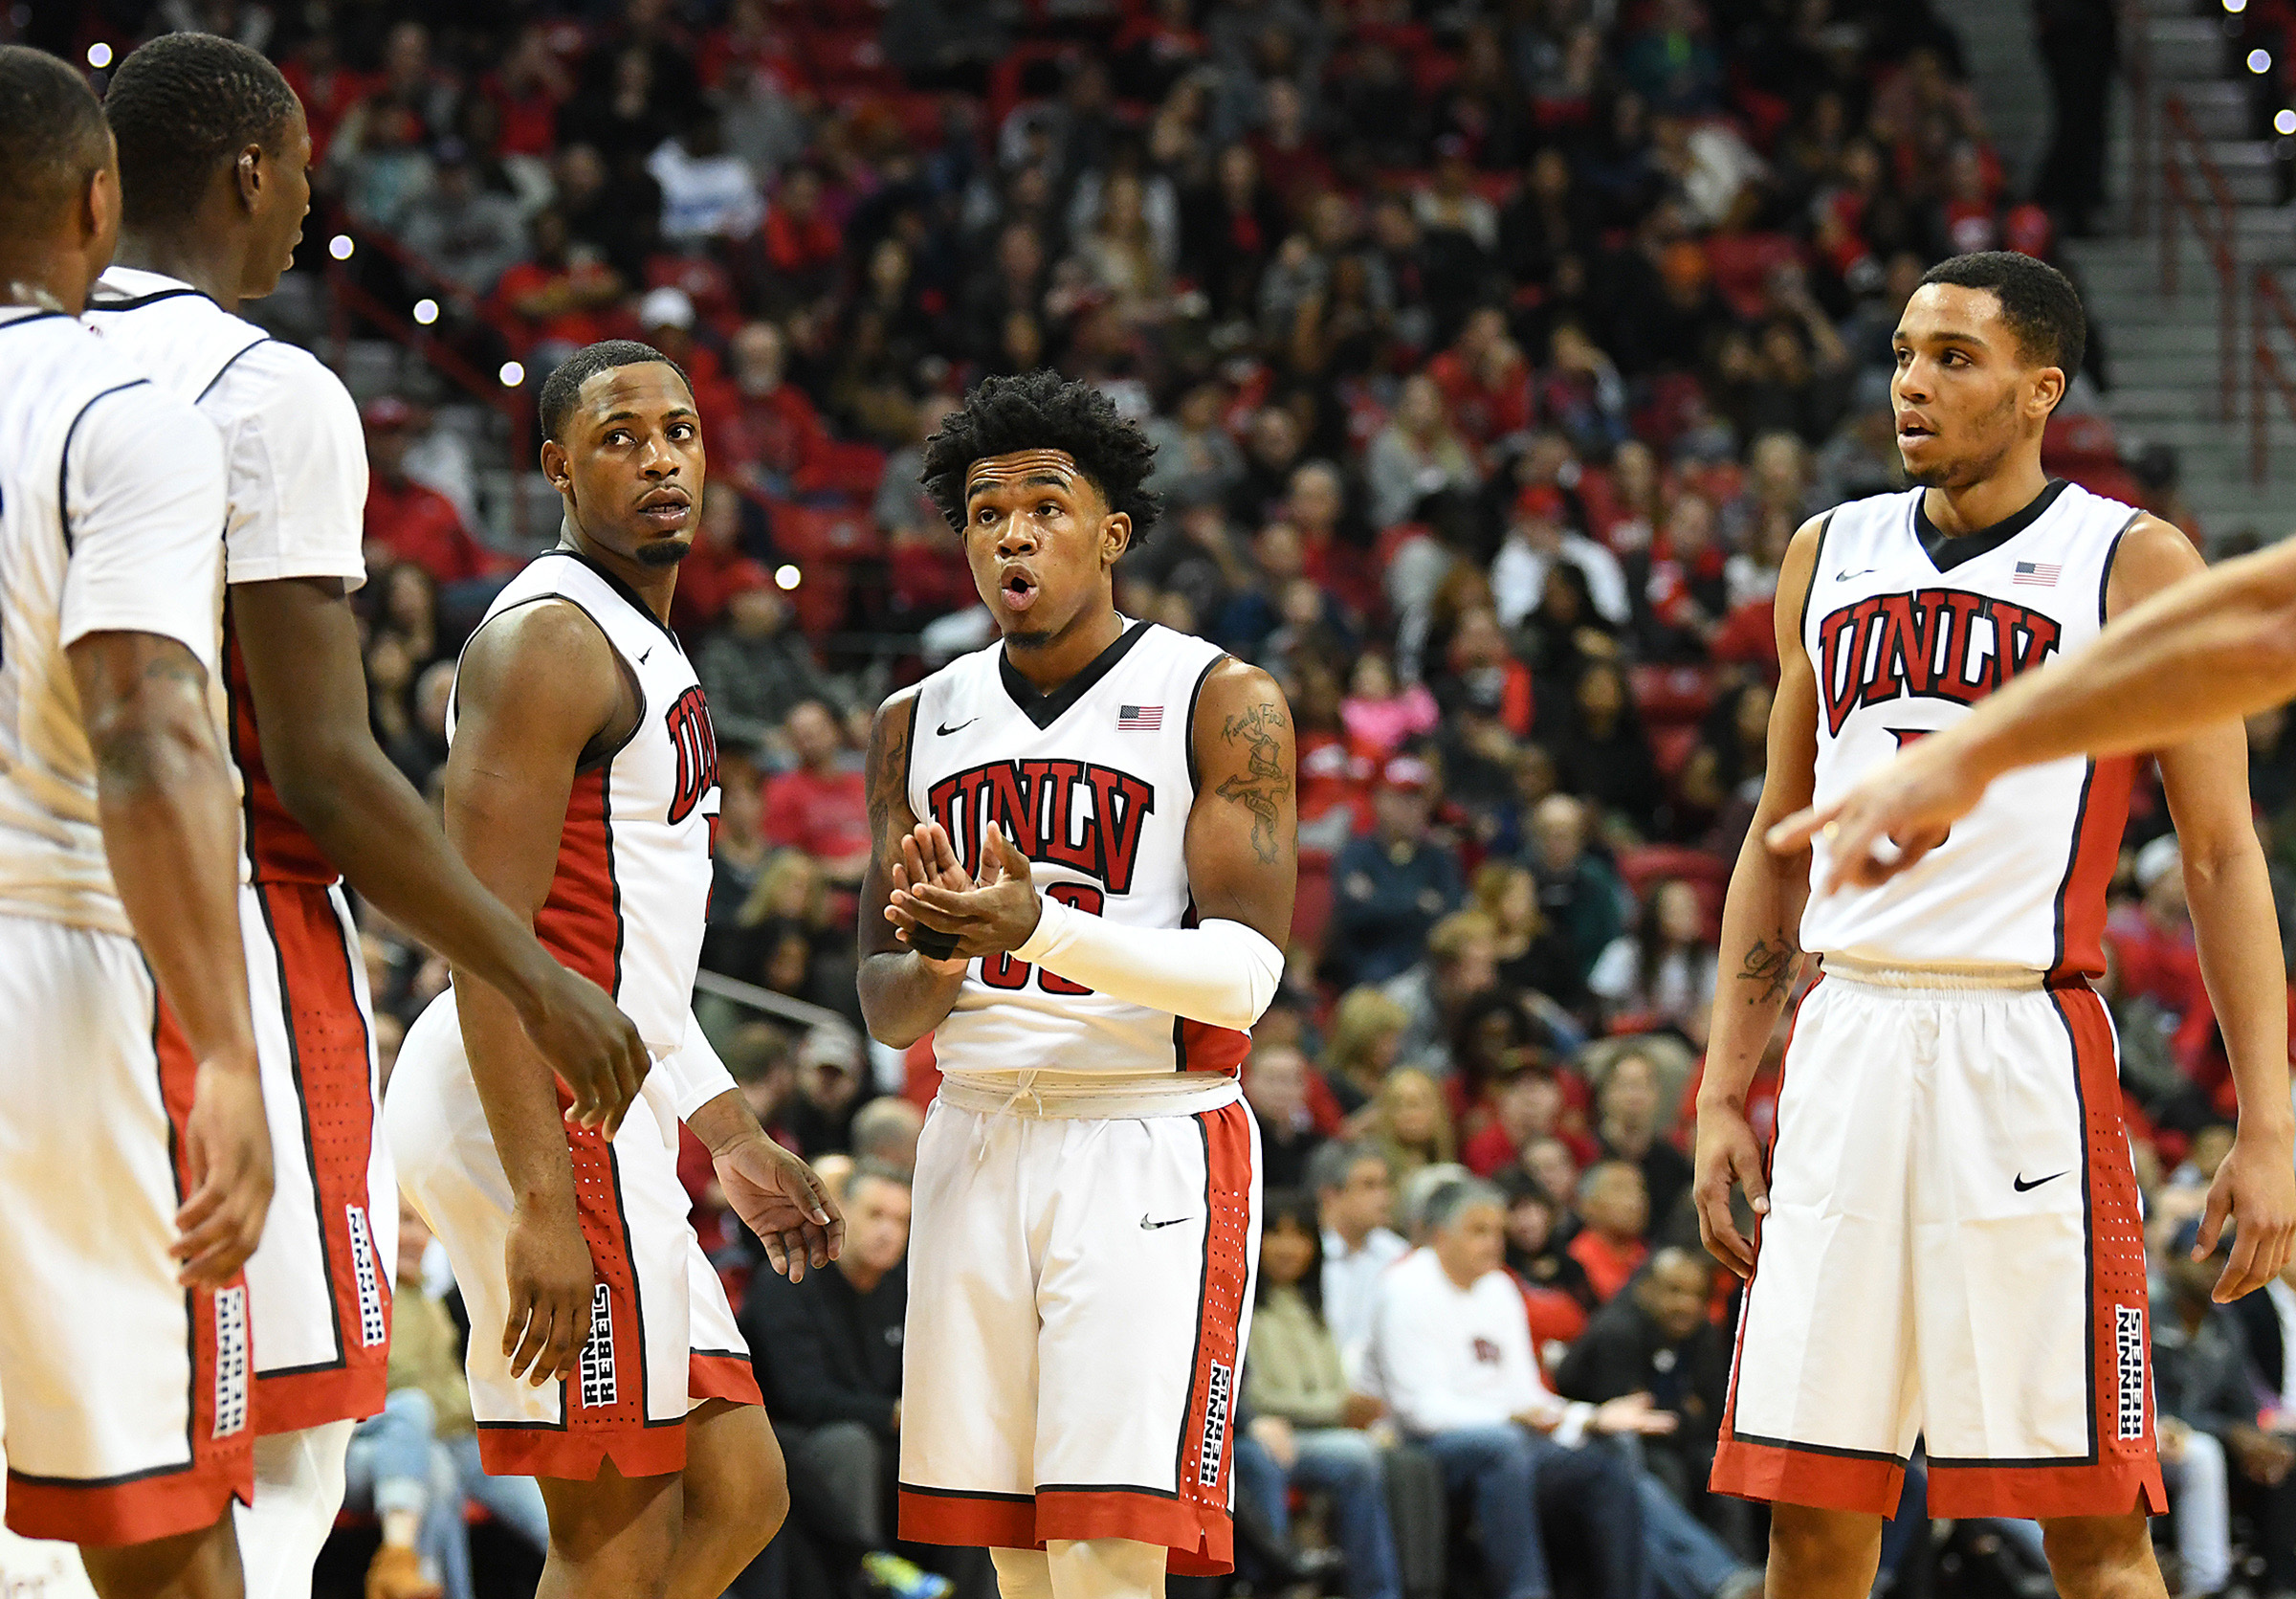 NCAA Basketball: San Diego State at UNLV